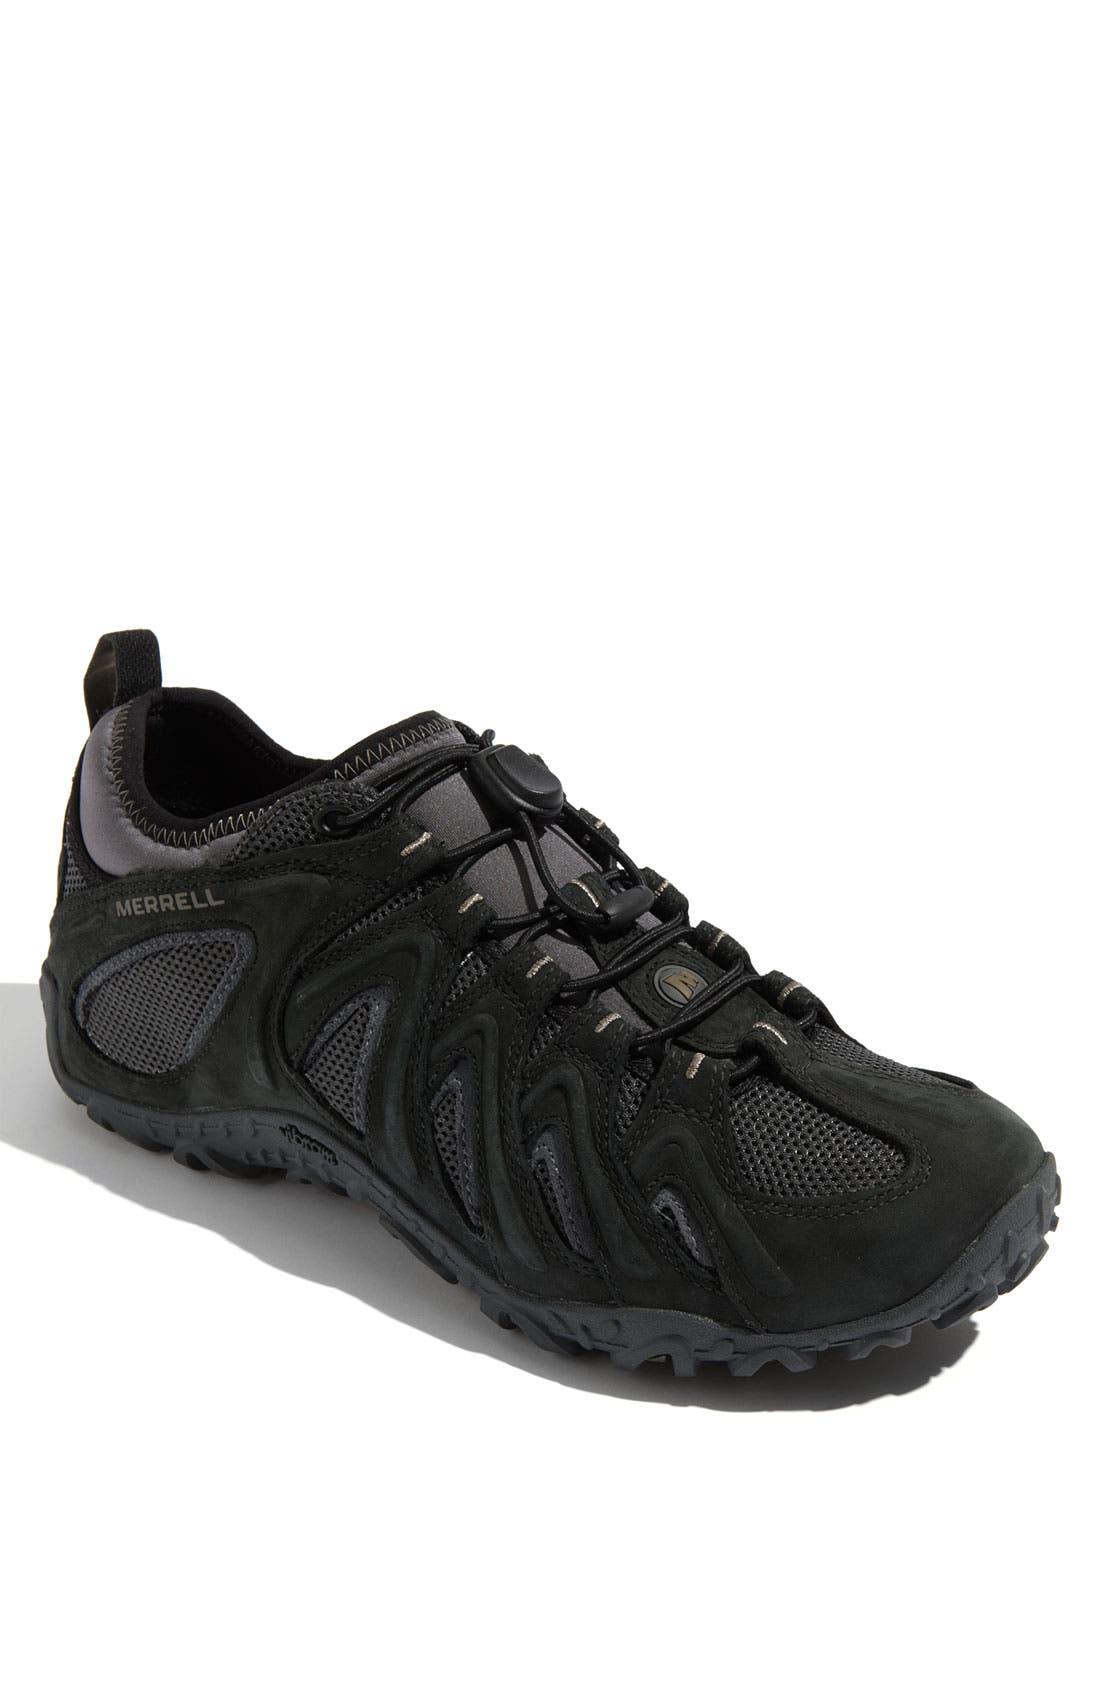 Alternate Image 1 Selected - Merrell 'Chameleon 4 Stretch' Hiking Shoe (Men) (Online Only)